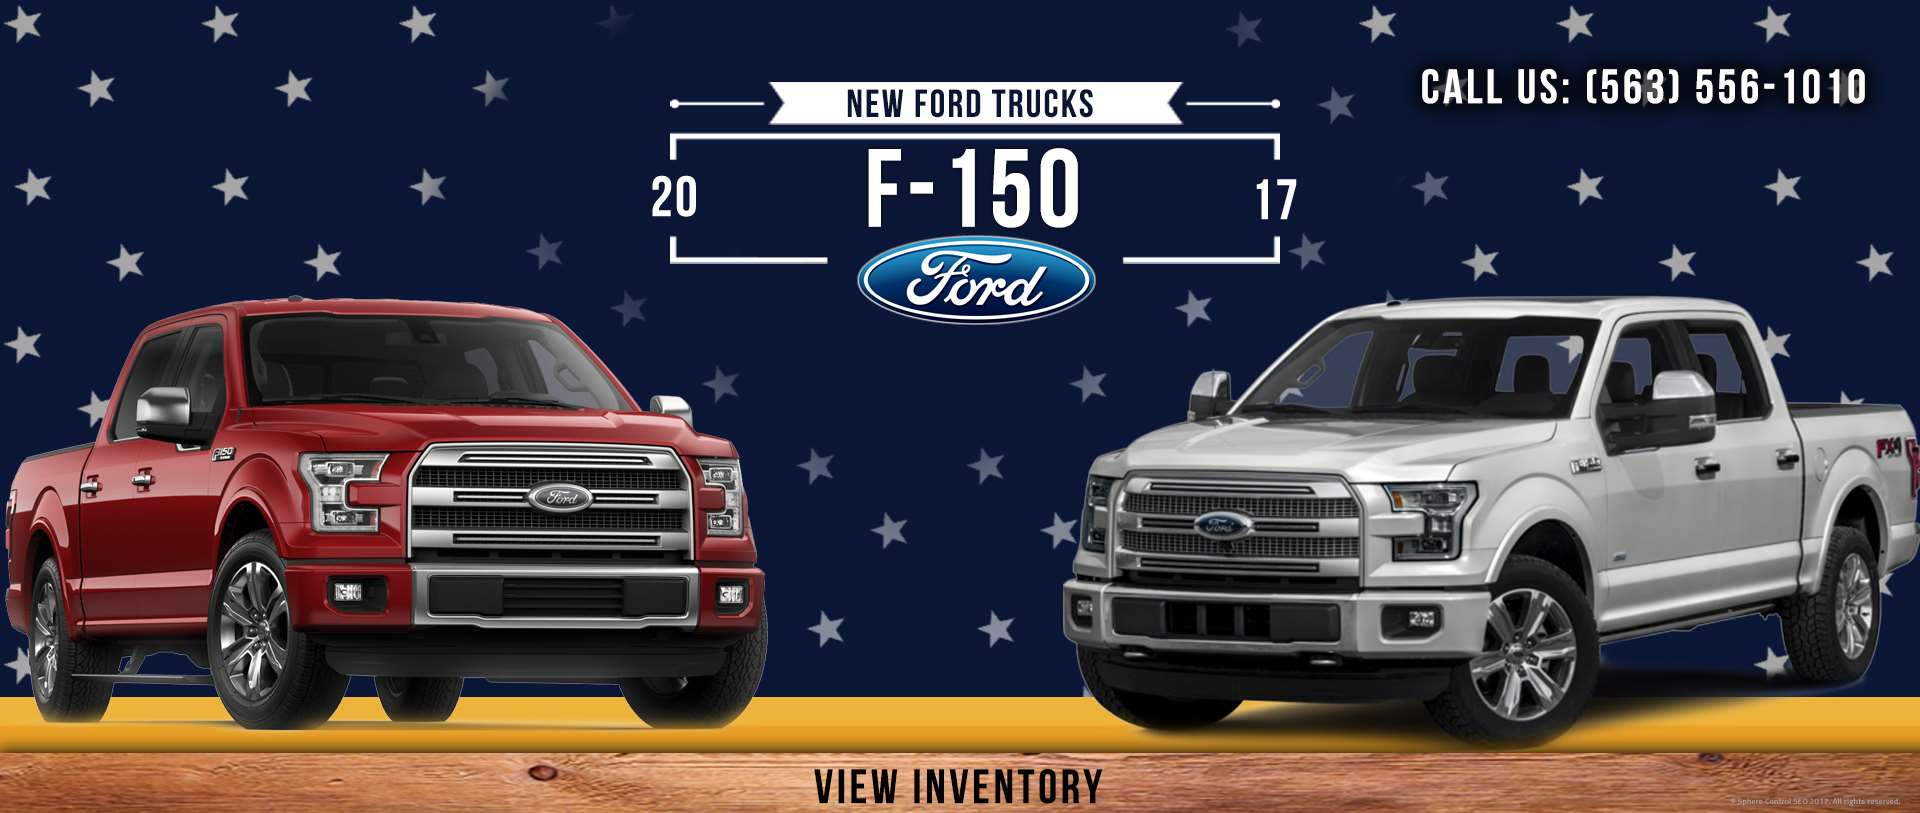 Finnin Ford Dubuque Iowa 52003 Mike Finnin Ford Of